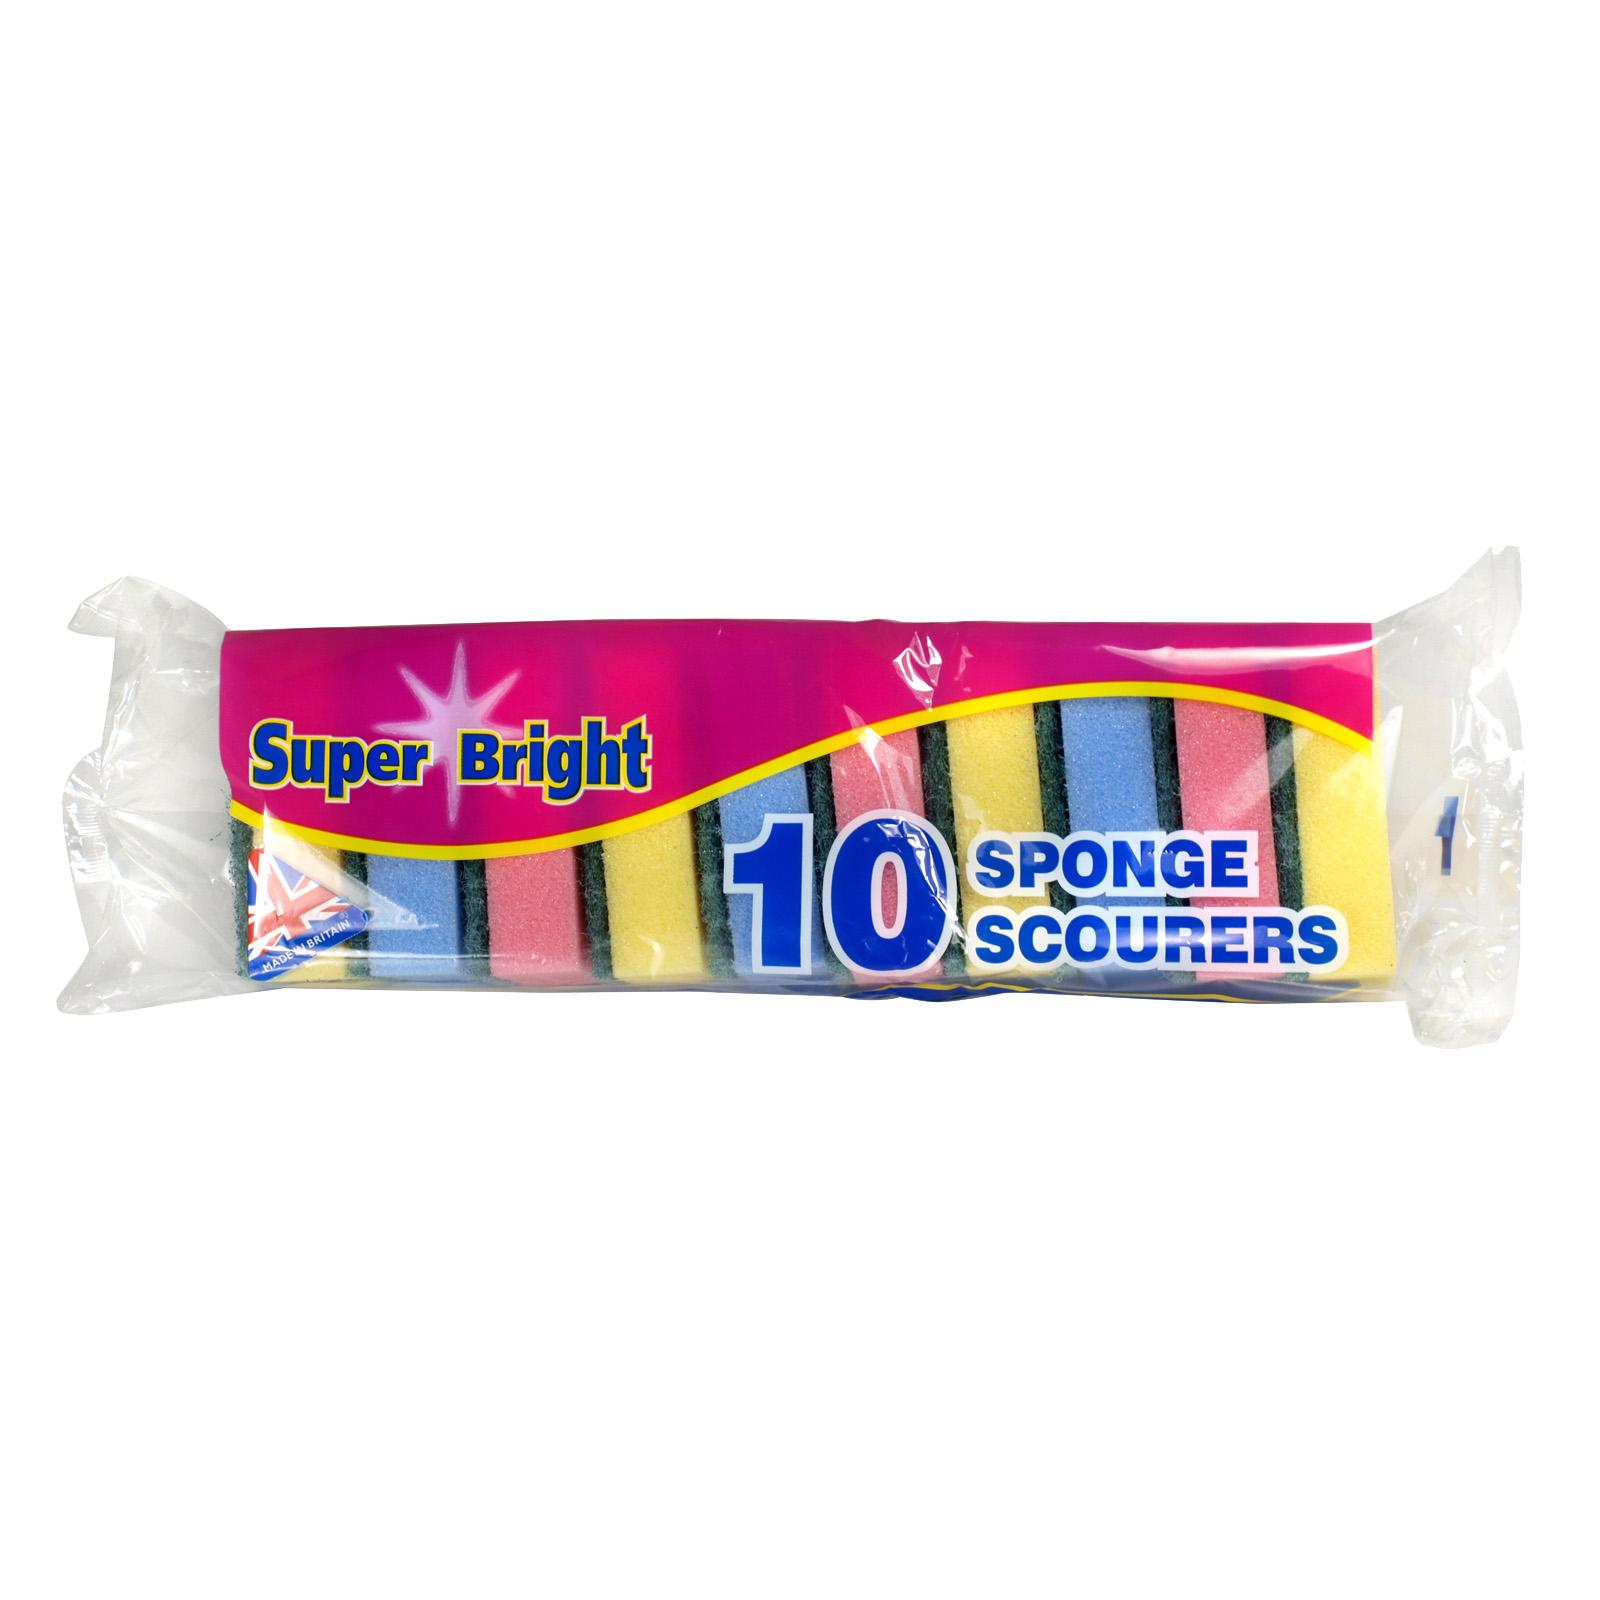 SUPERBRIGHT 10 SPONGE SCOURERS X10